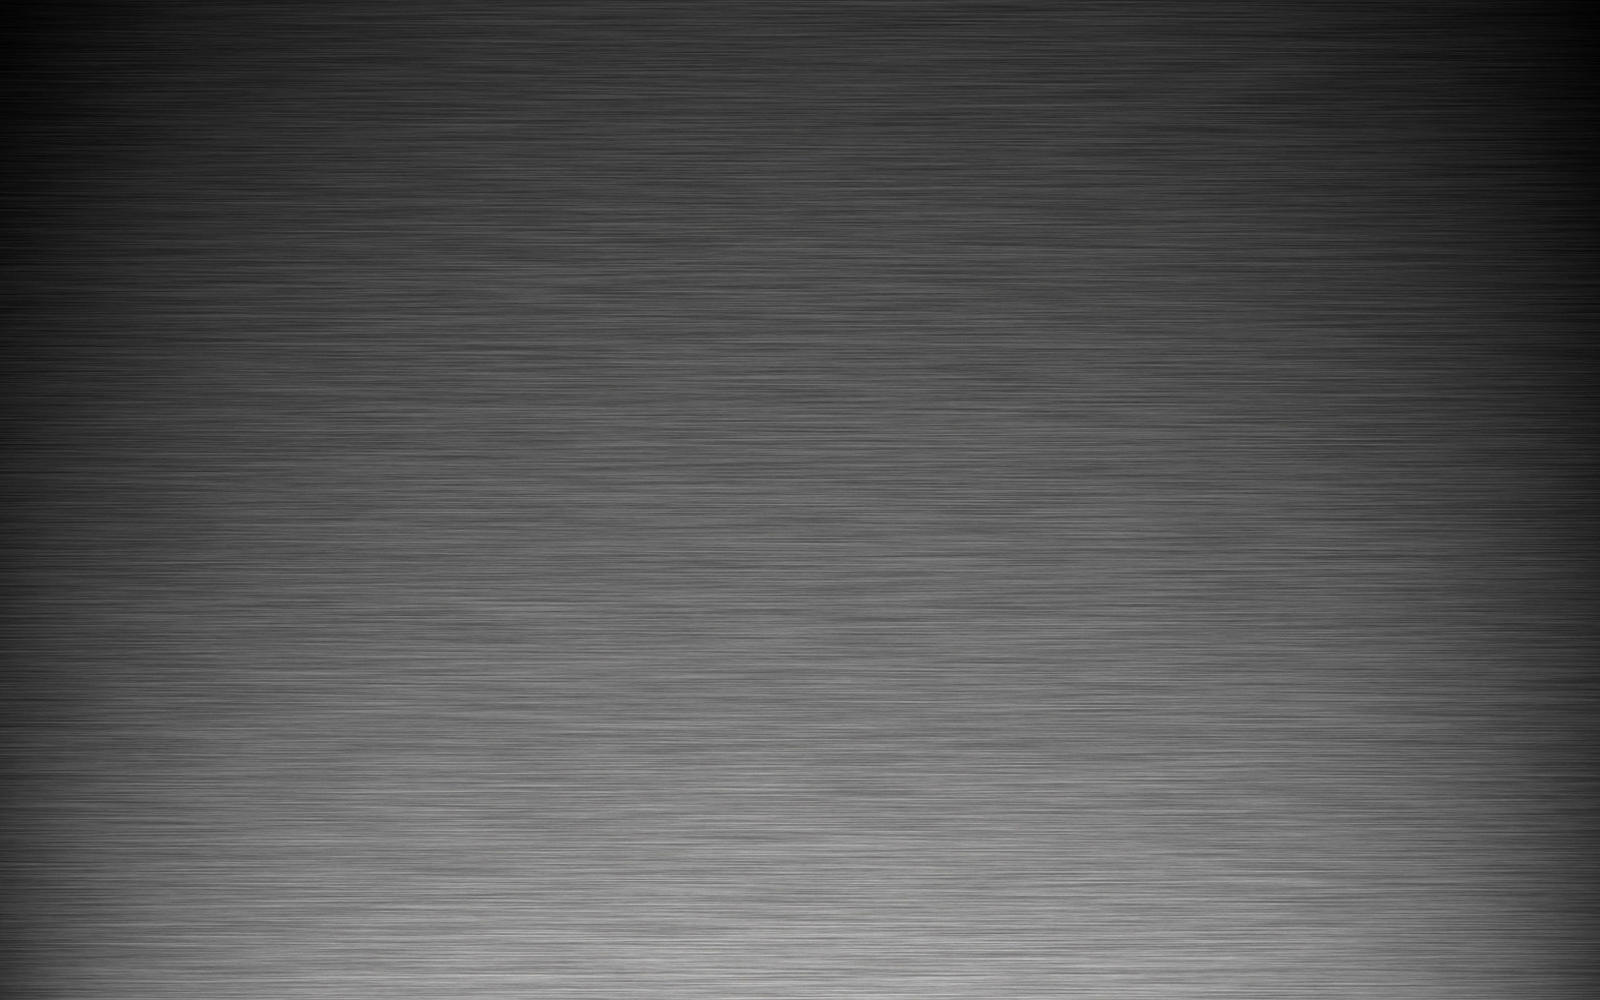 brushed aluminum dark by TheFuelofInspiration